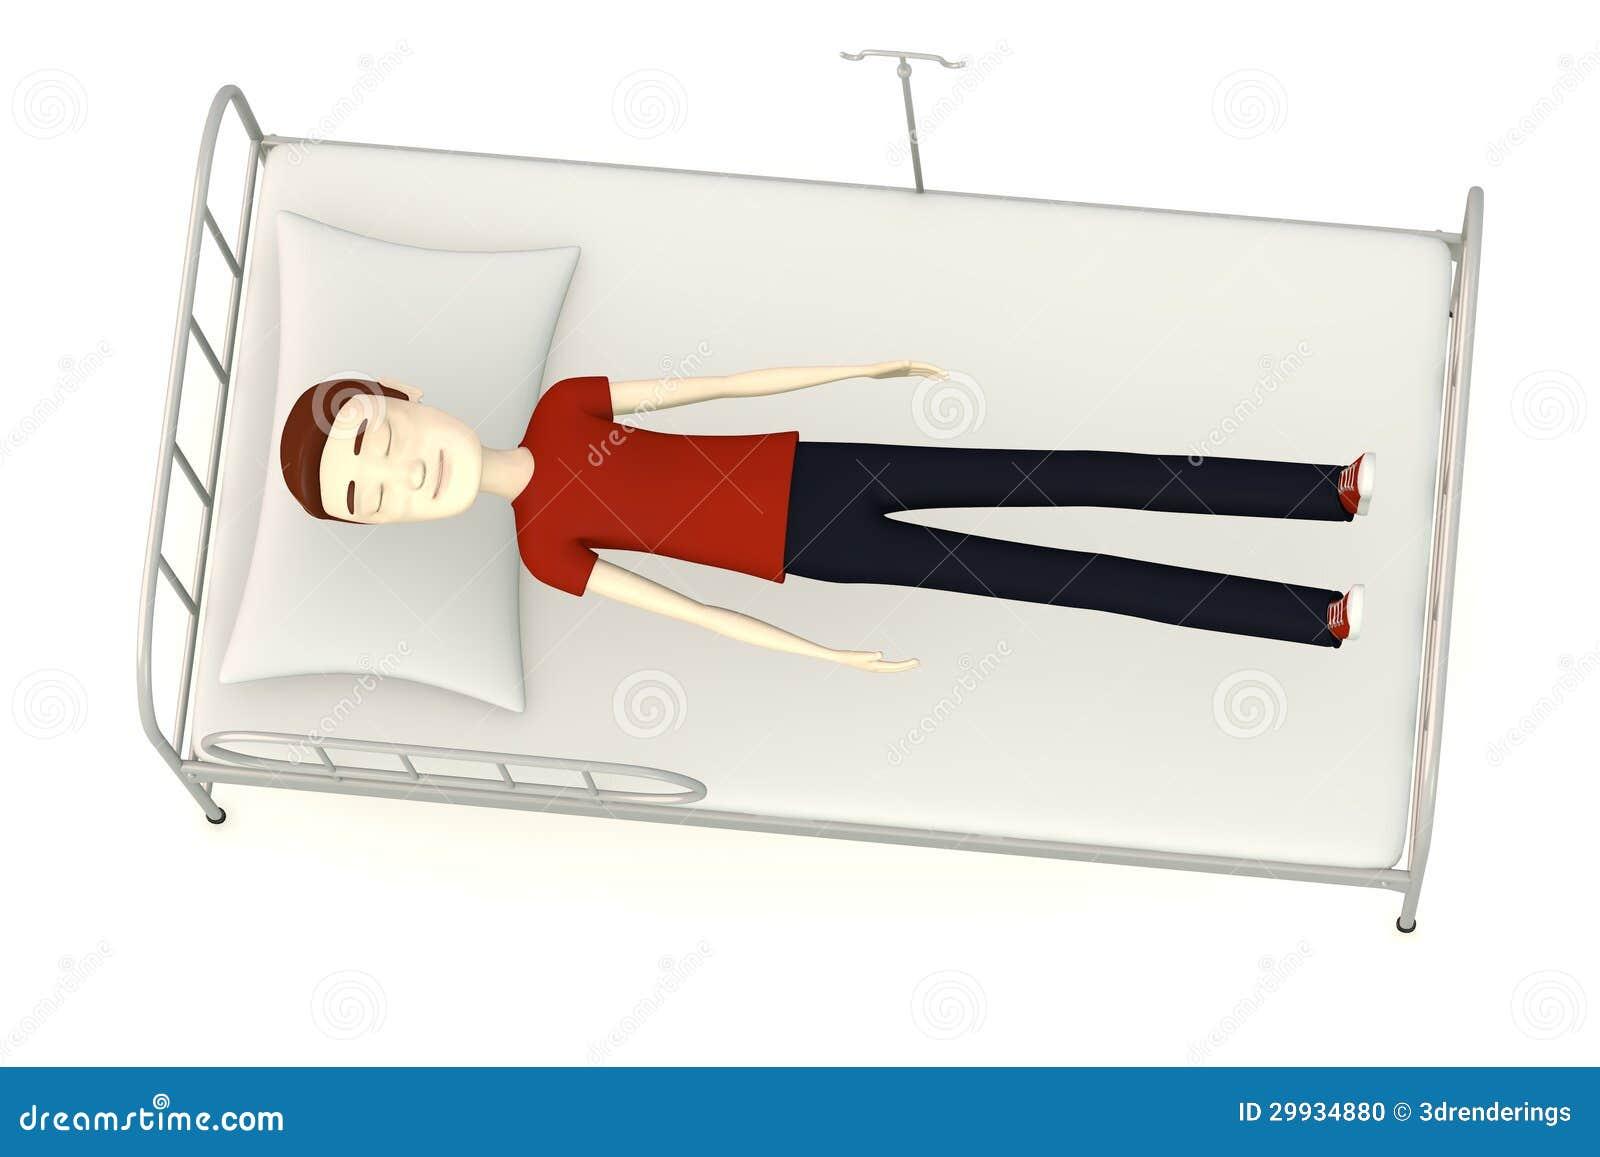 Cartoon Man On Hospital Bed